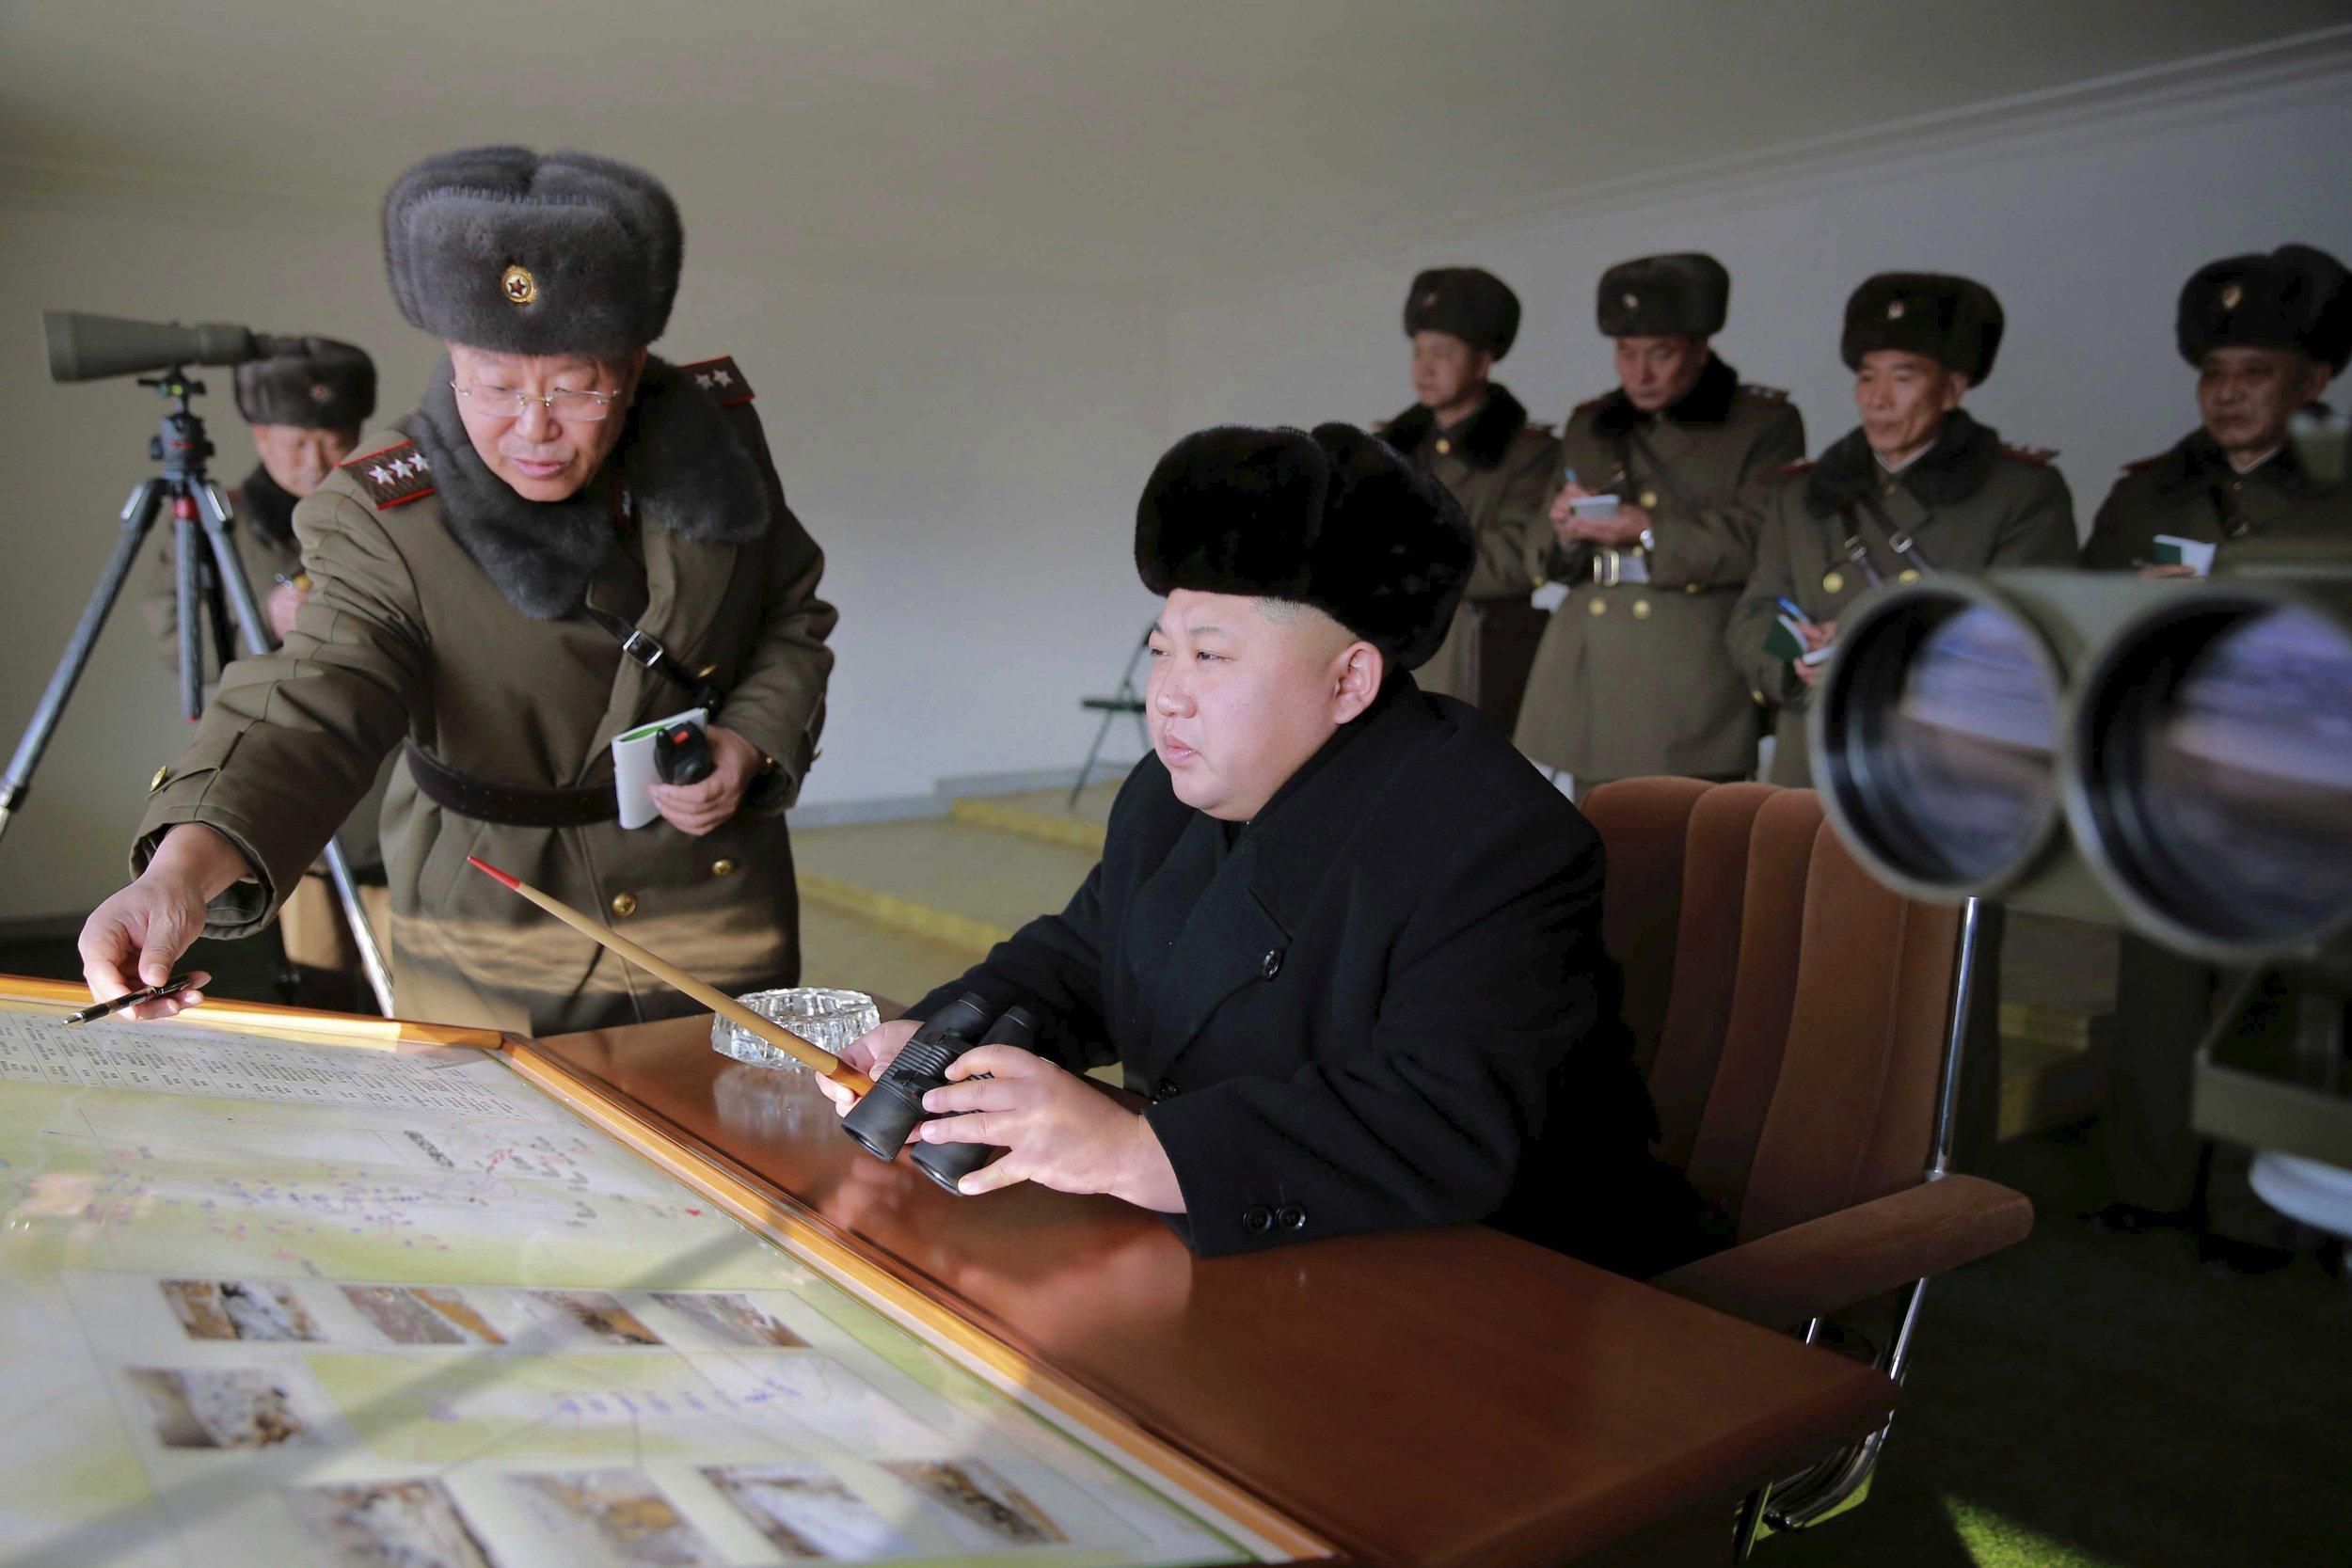 0106_Republicans_North_Korea_nuclear_test_01